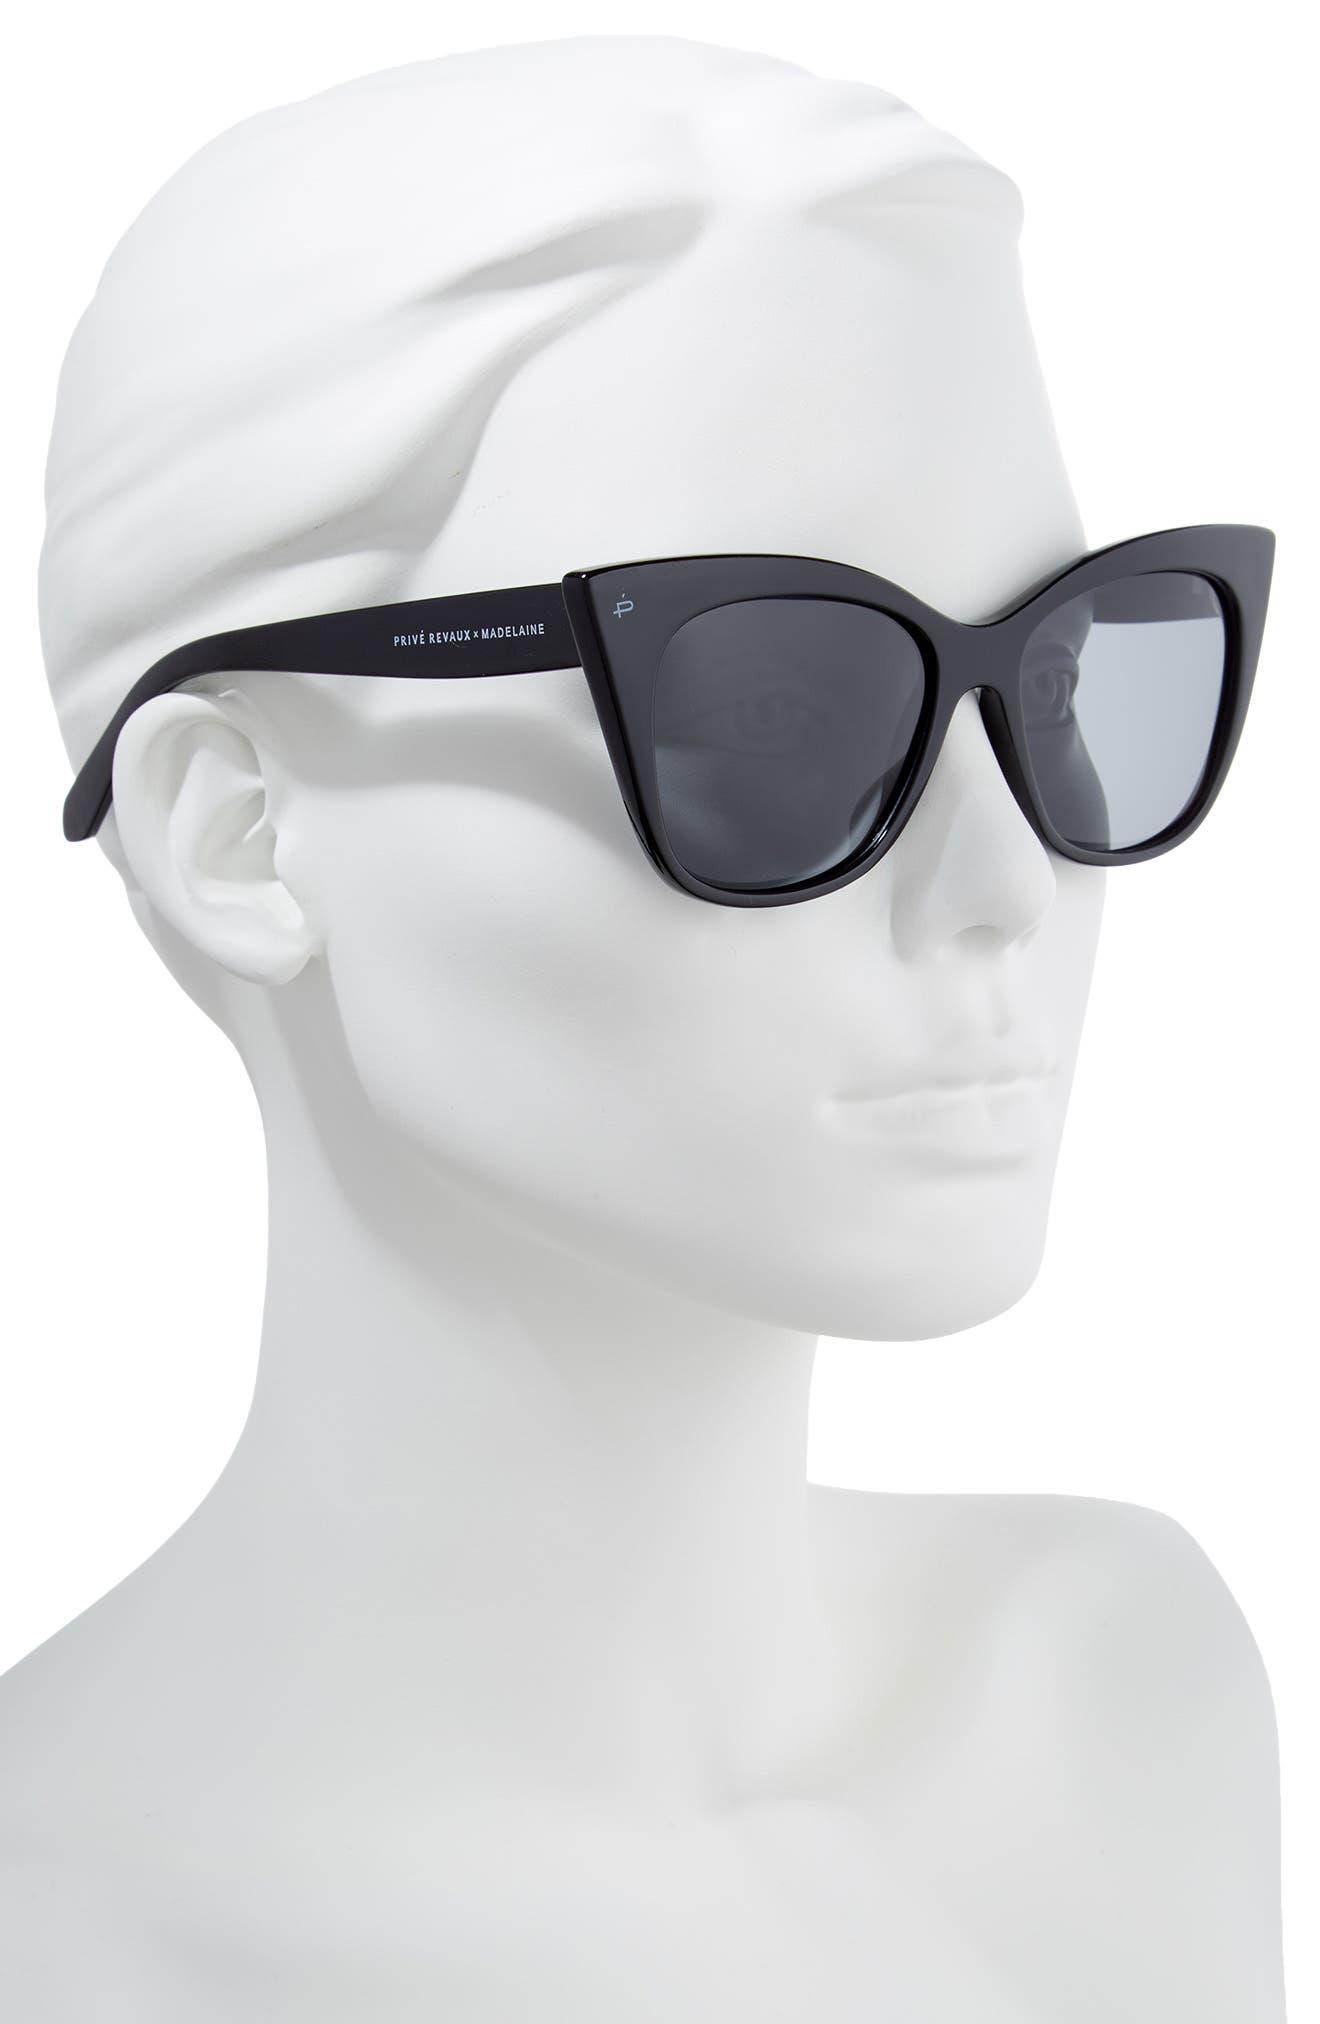 Privé Revaux x Madelaine Petsch The Mister 54mm Cat Eye Sunglasses,                             Alternate thumbnail 3, color,                             Black/ Black